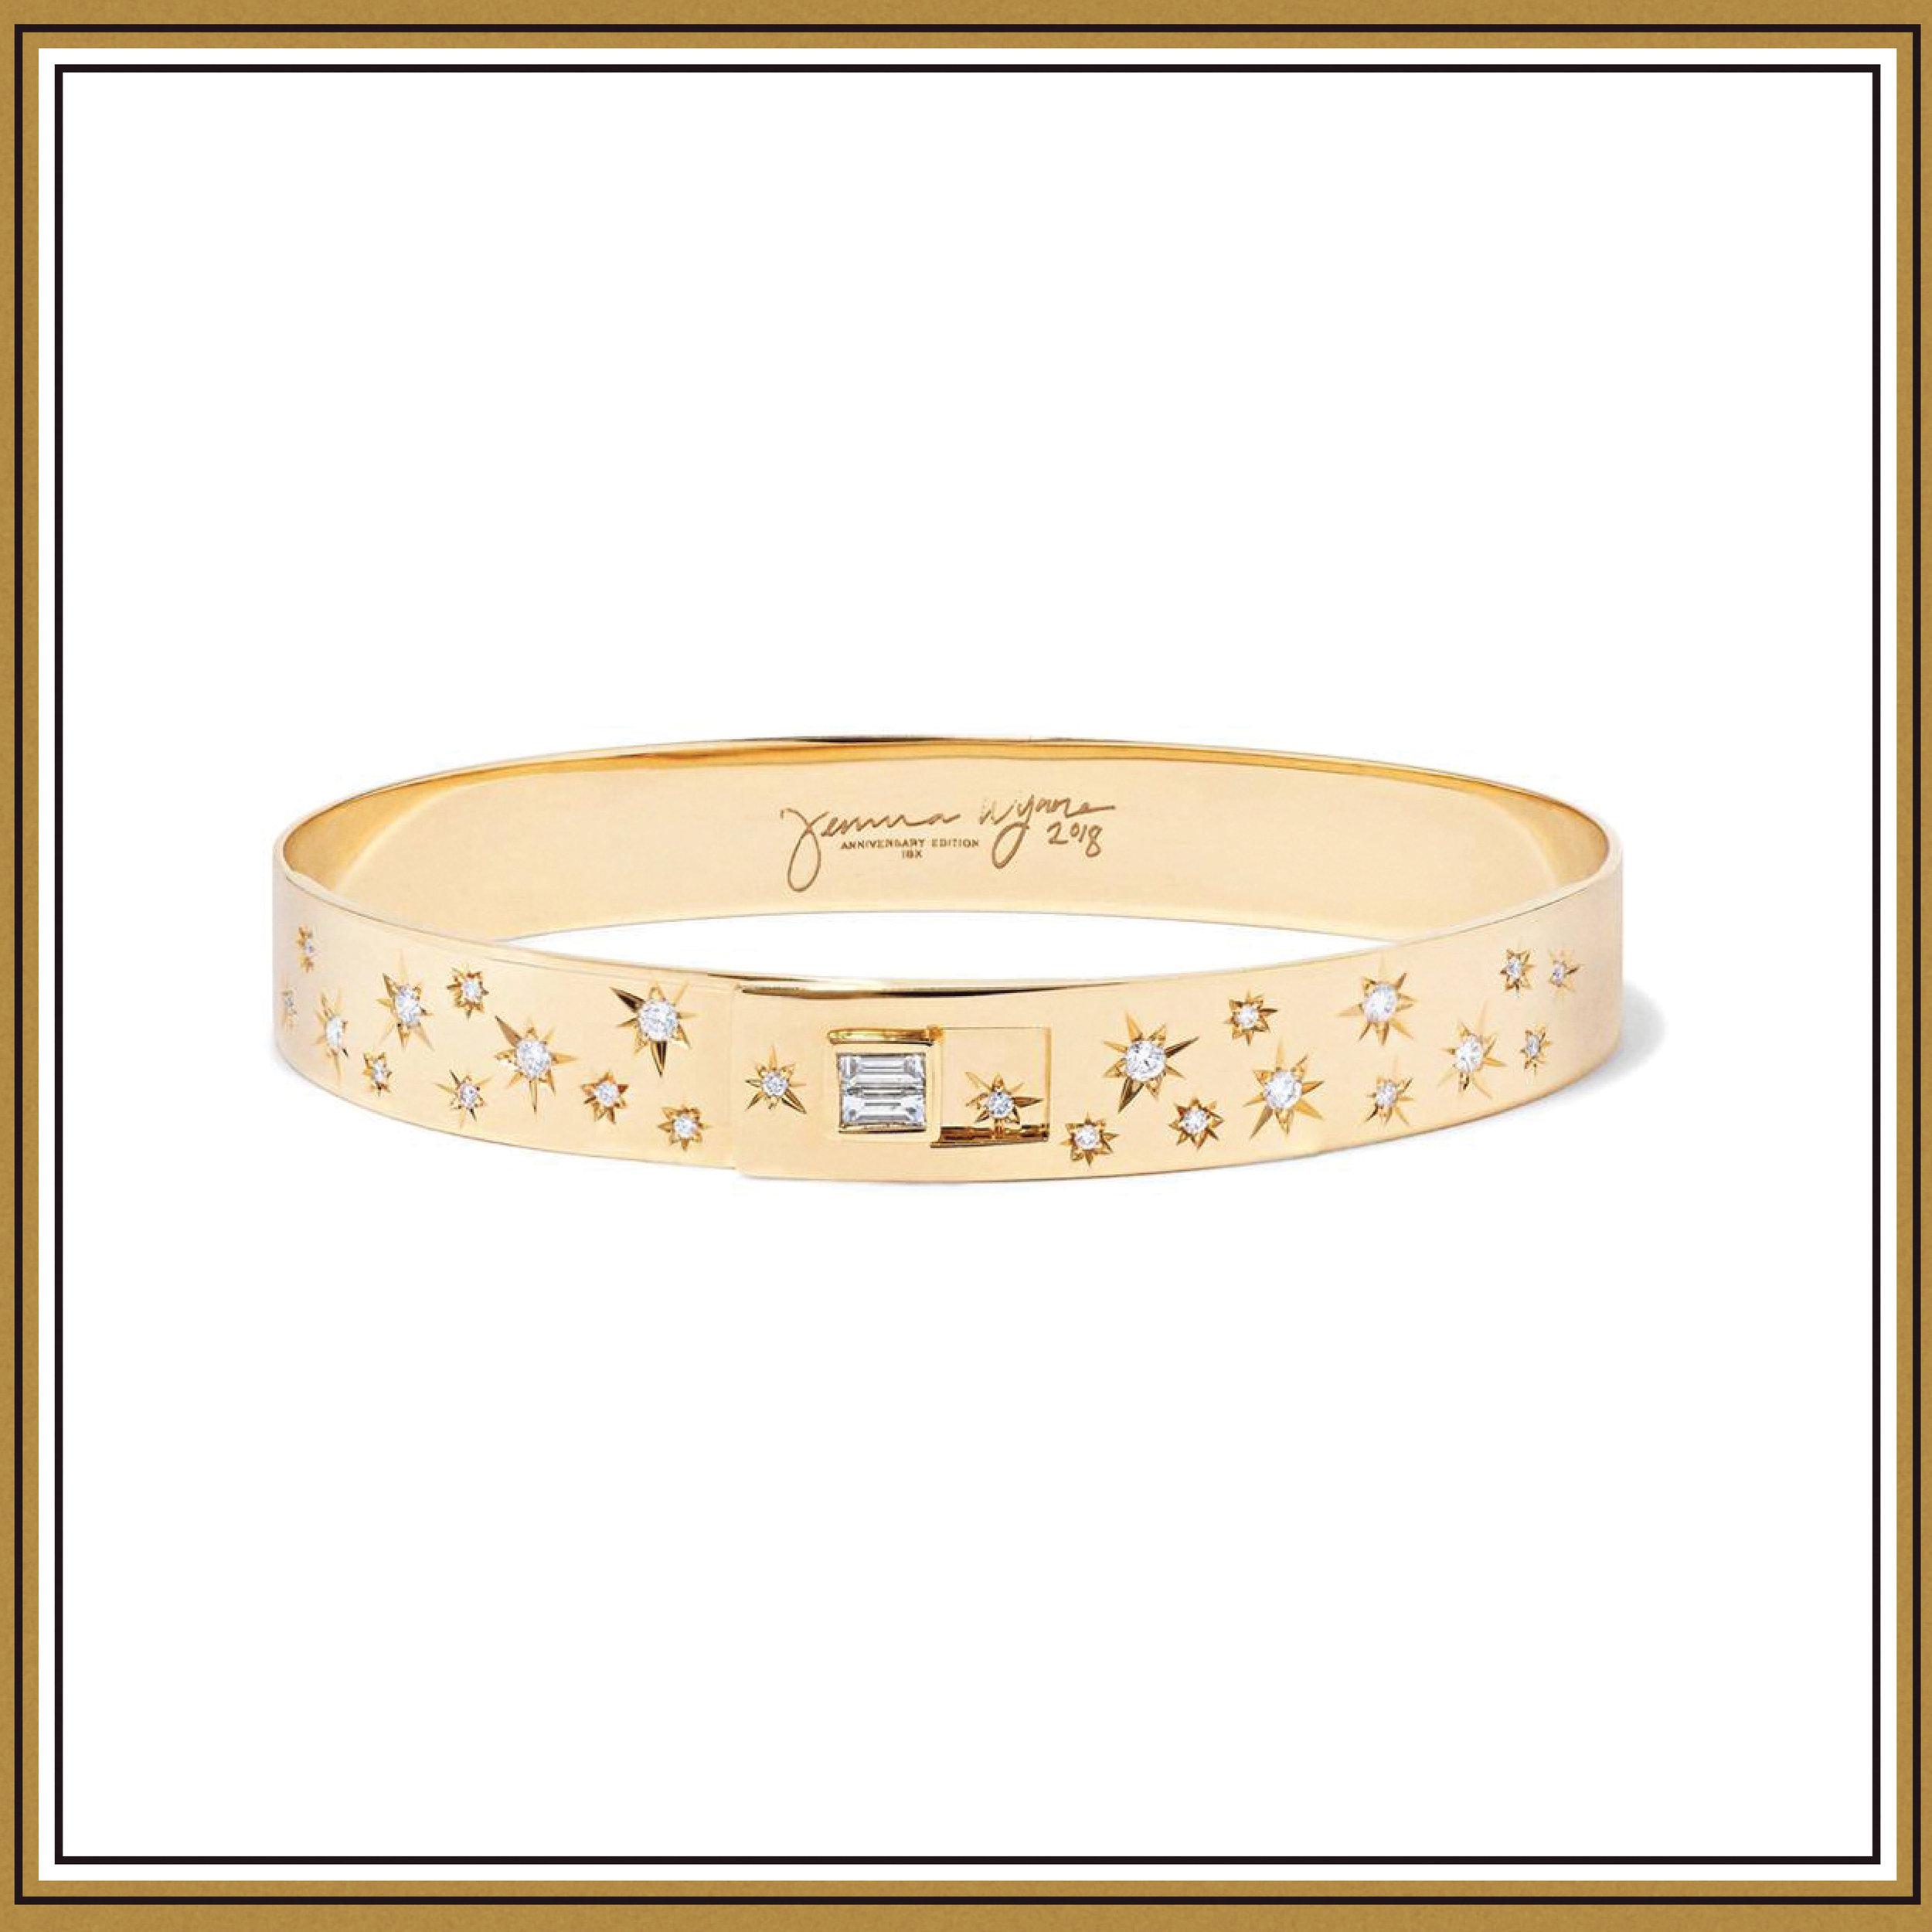 Jemma Wynne 18-Karat Gold Diamond Bracelet ($8925)